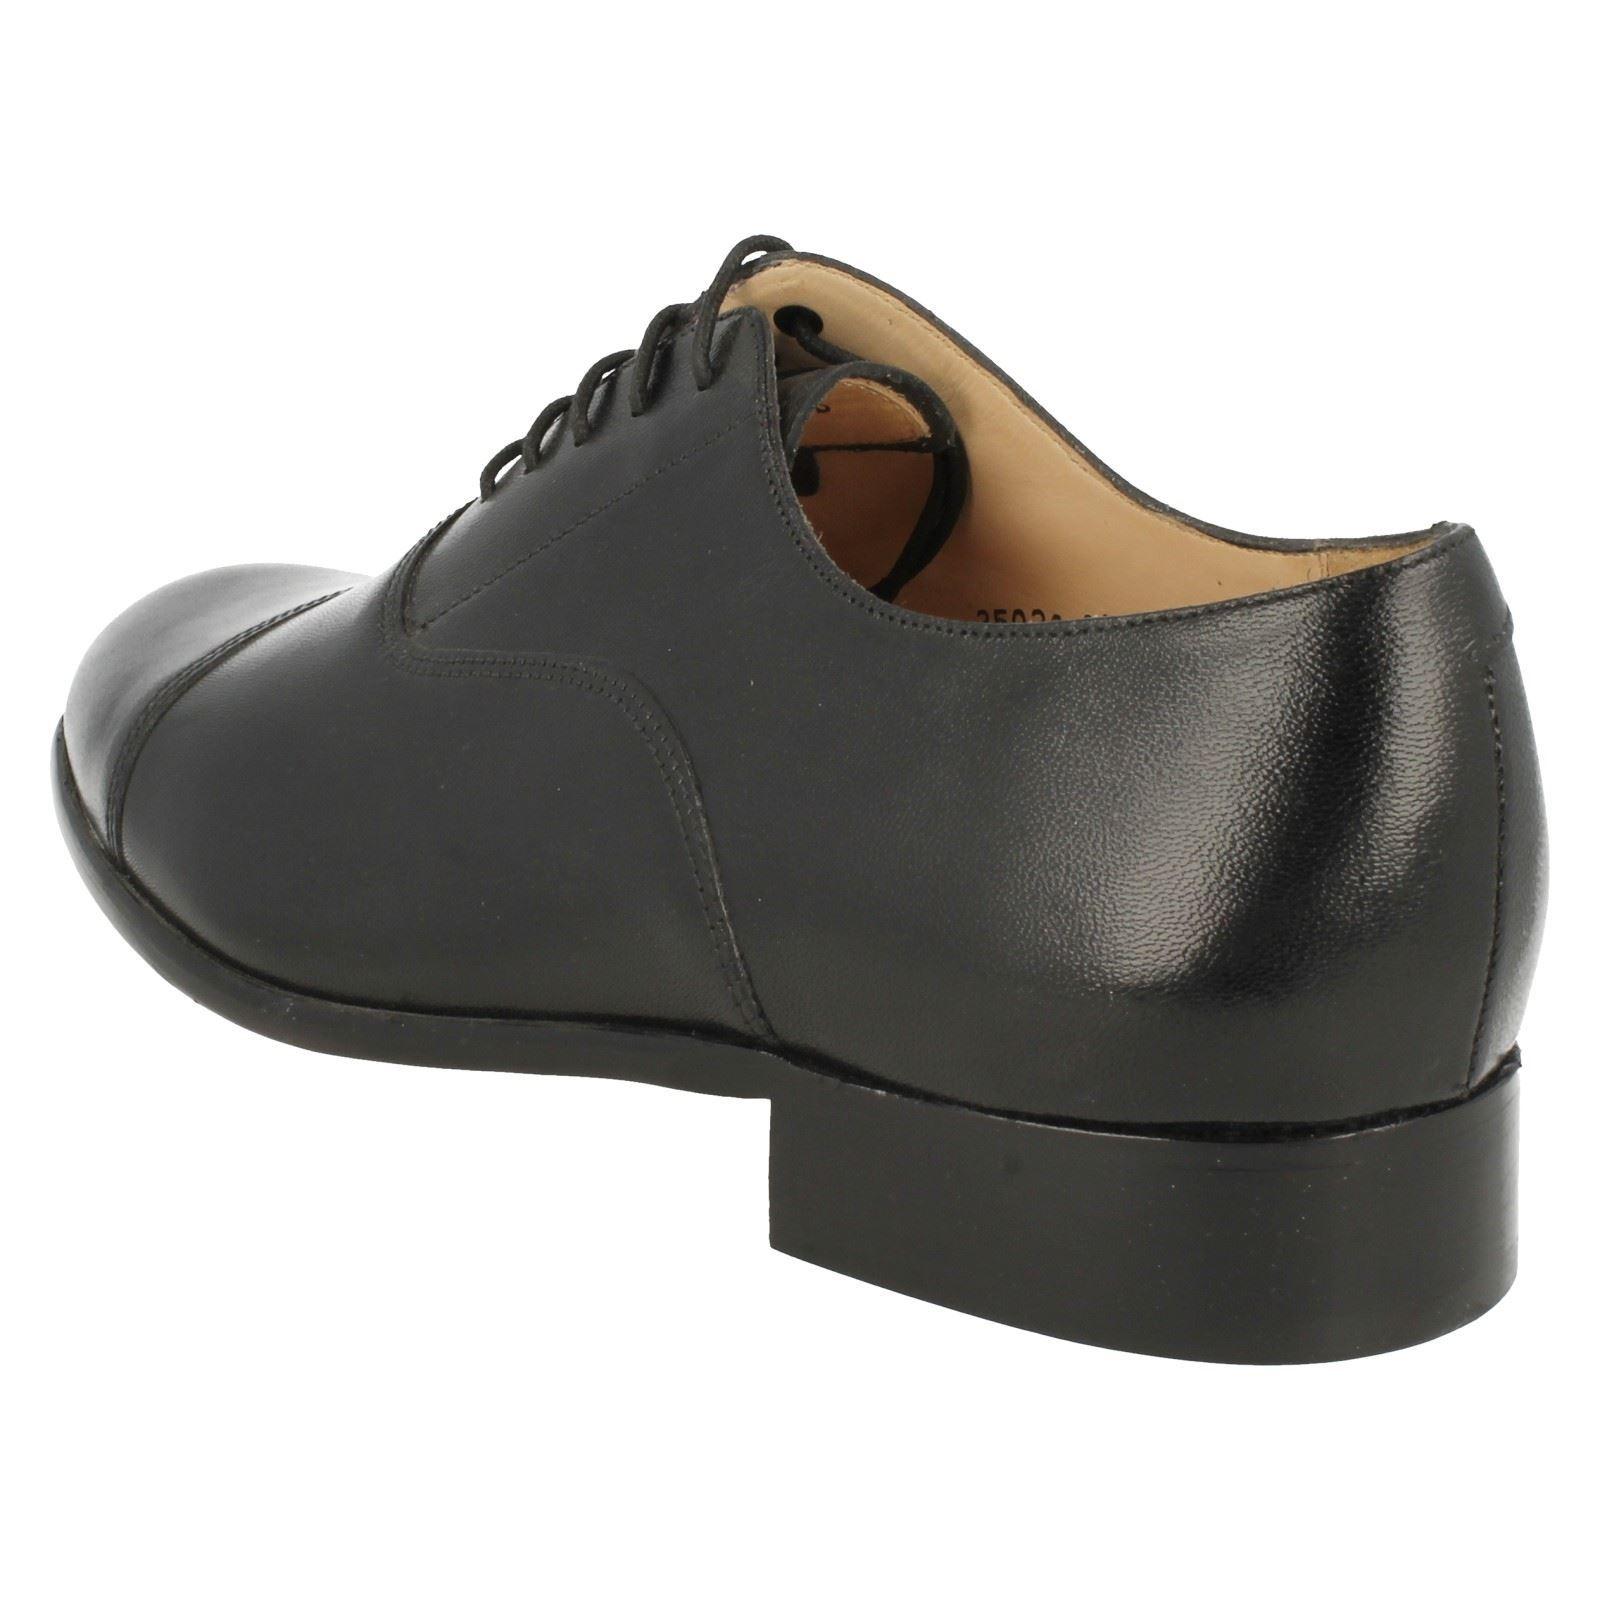 Herren Grenson Oxford Lace Lace Lace Up Schuhes Paddington 0e64ba